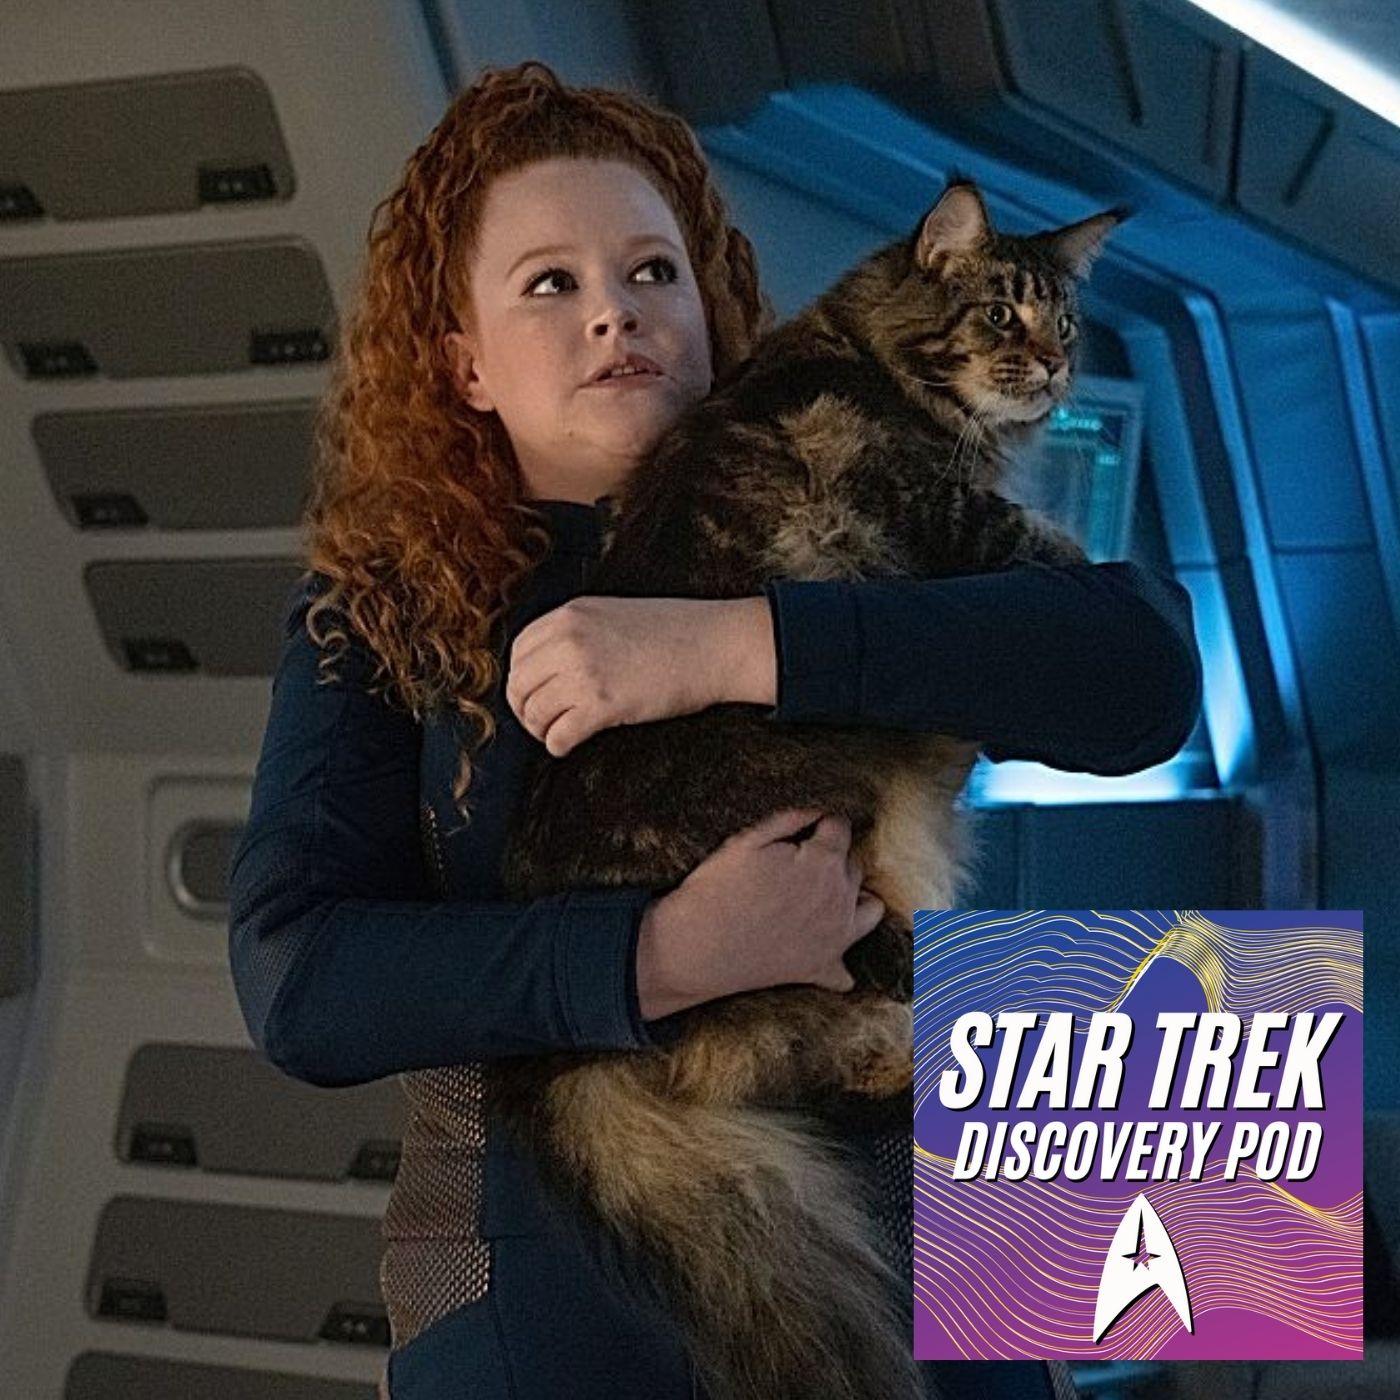 Star Trek Discovery Season 3 Episode 6 'Scavengers' Review